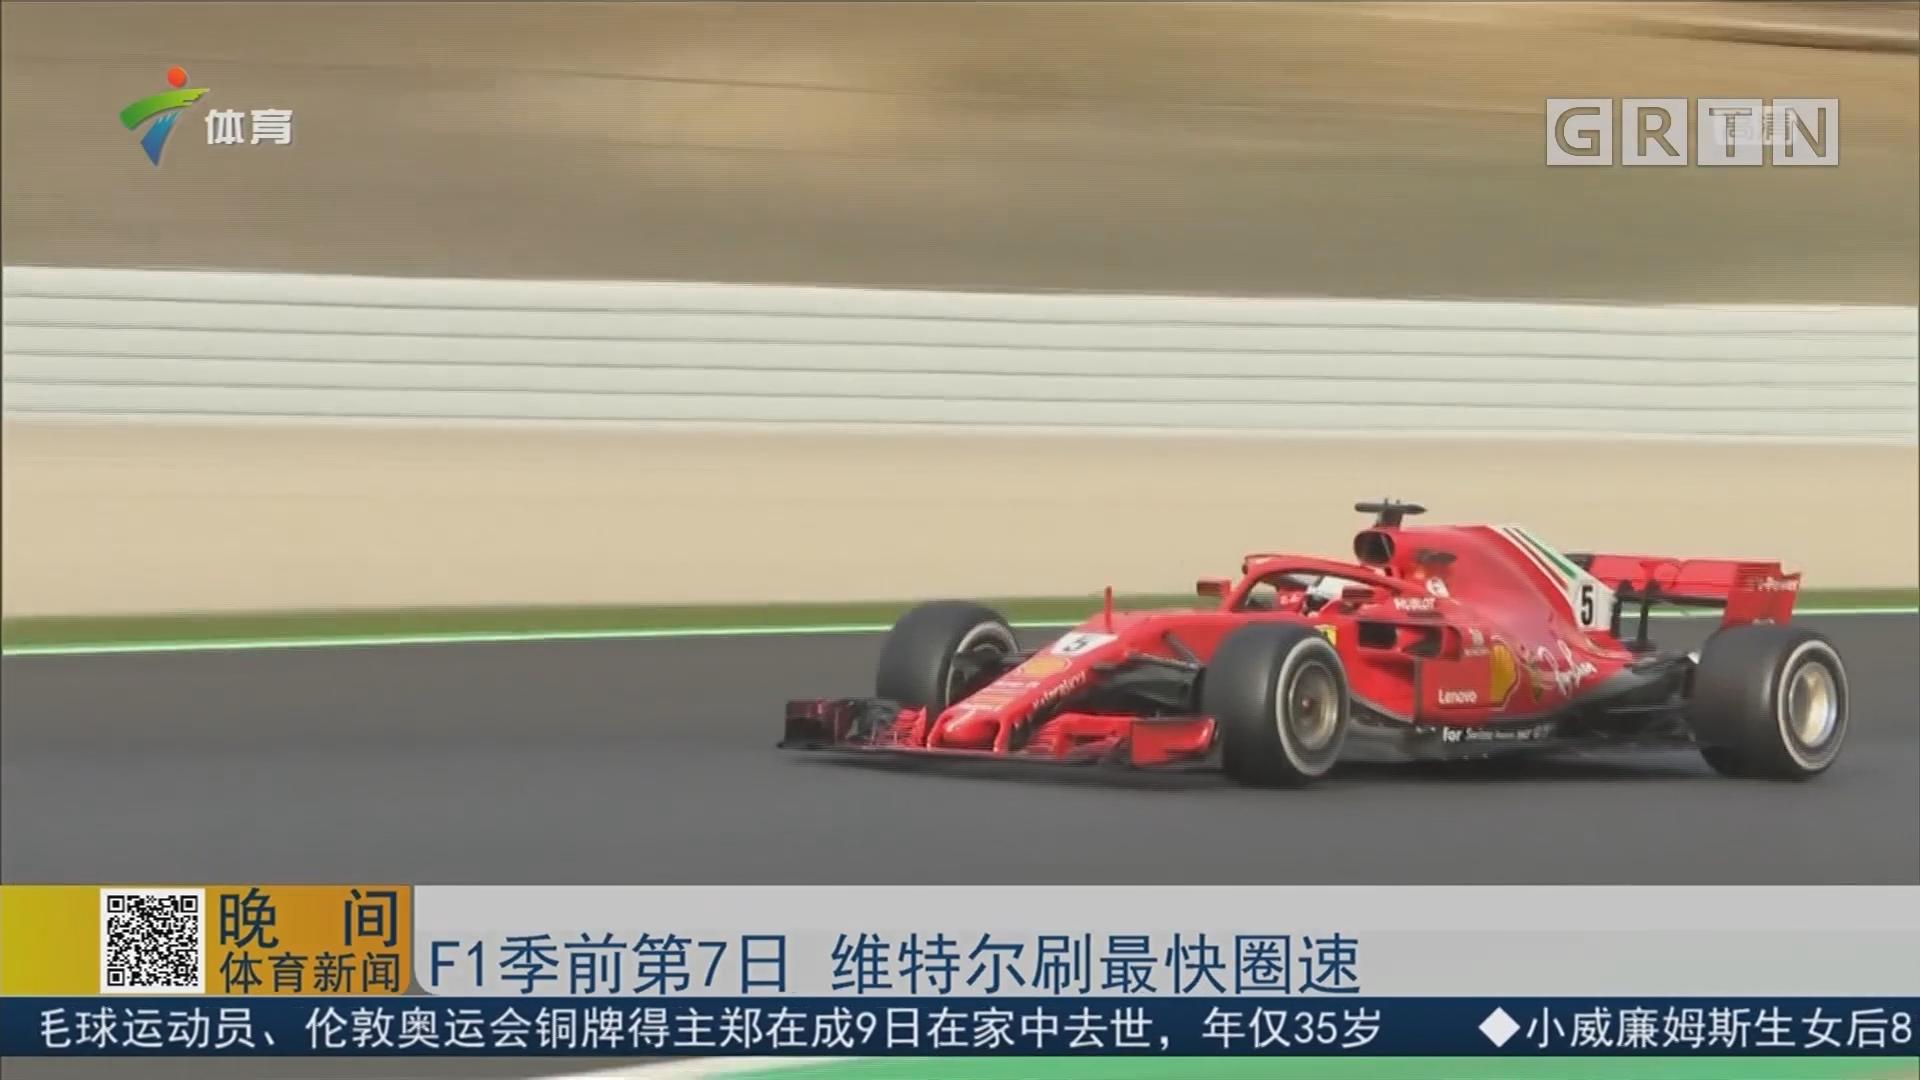 F1季前第7日 维特尔刷最快圈速